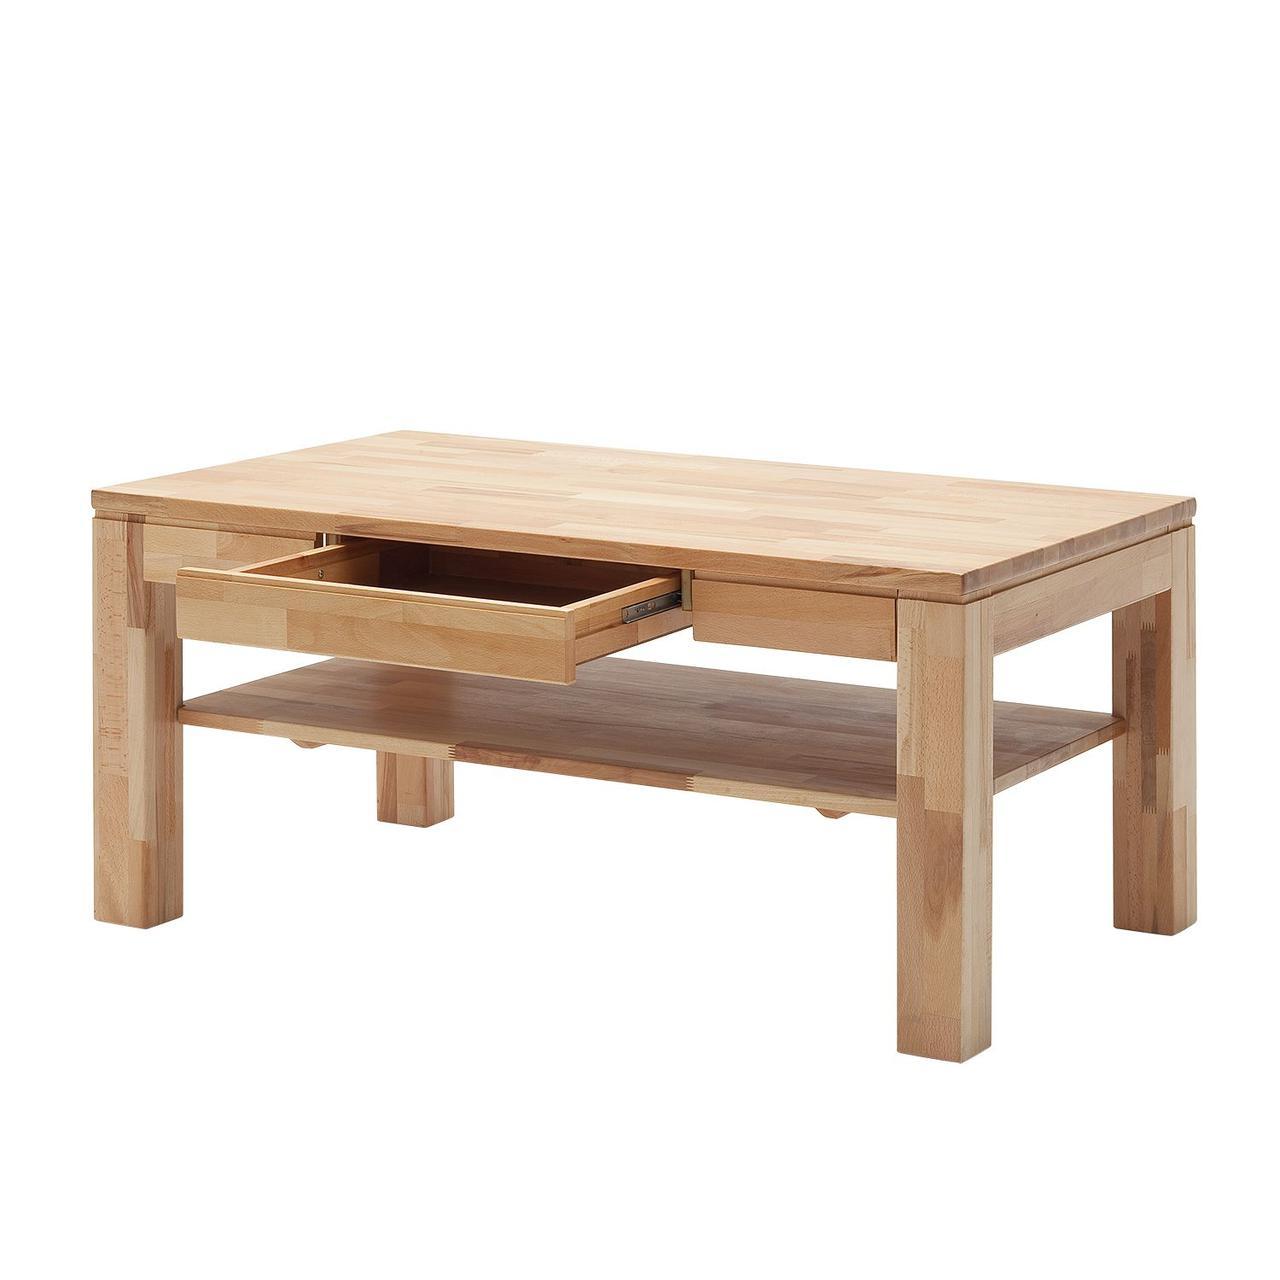 Журнальный столик Mobler sj009 115х70х54 см бук